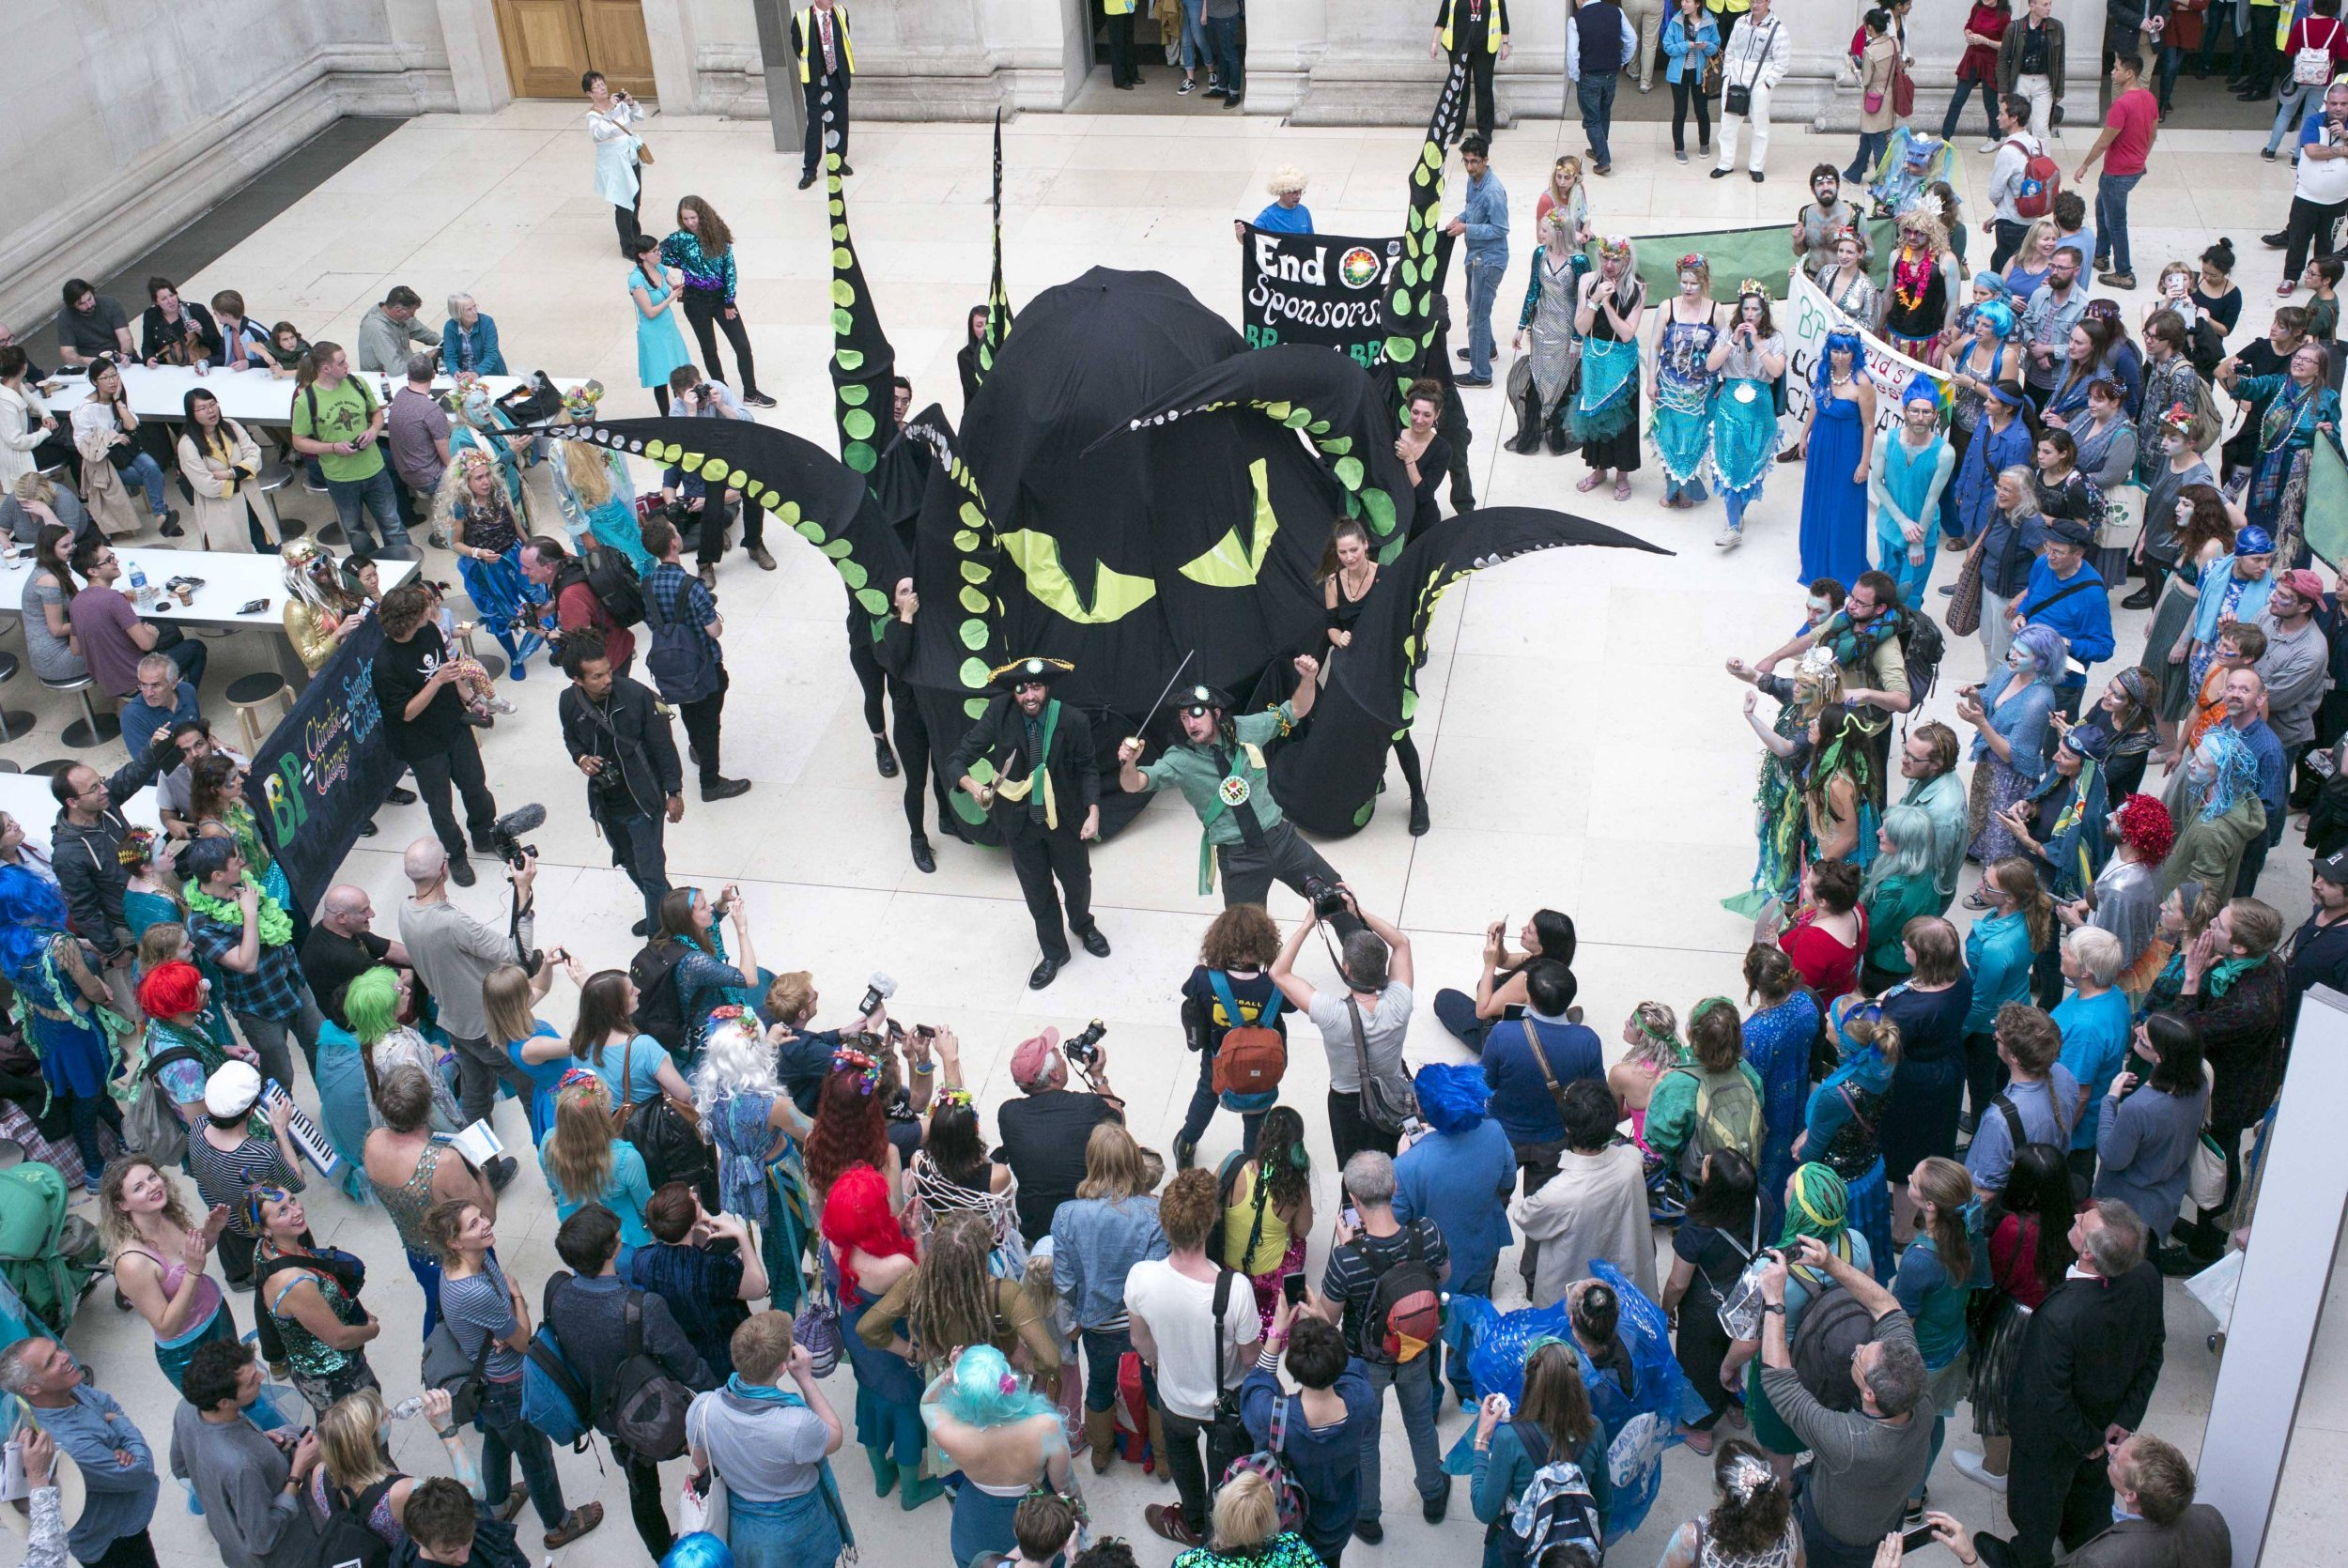 Protesters storm British Museum with massive kraken for 'splashmob'